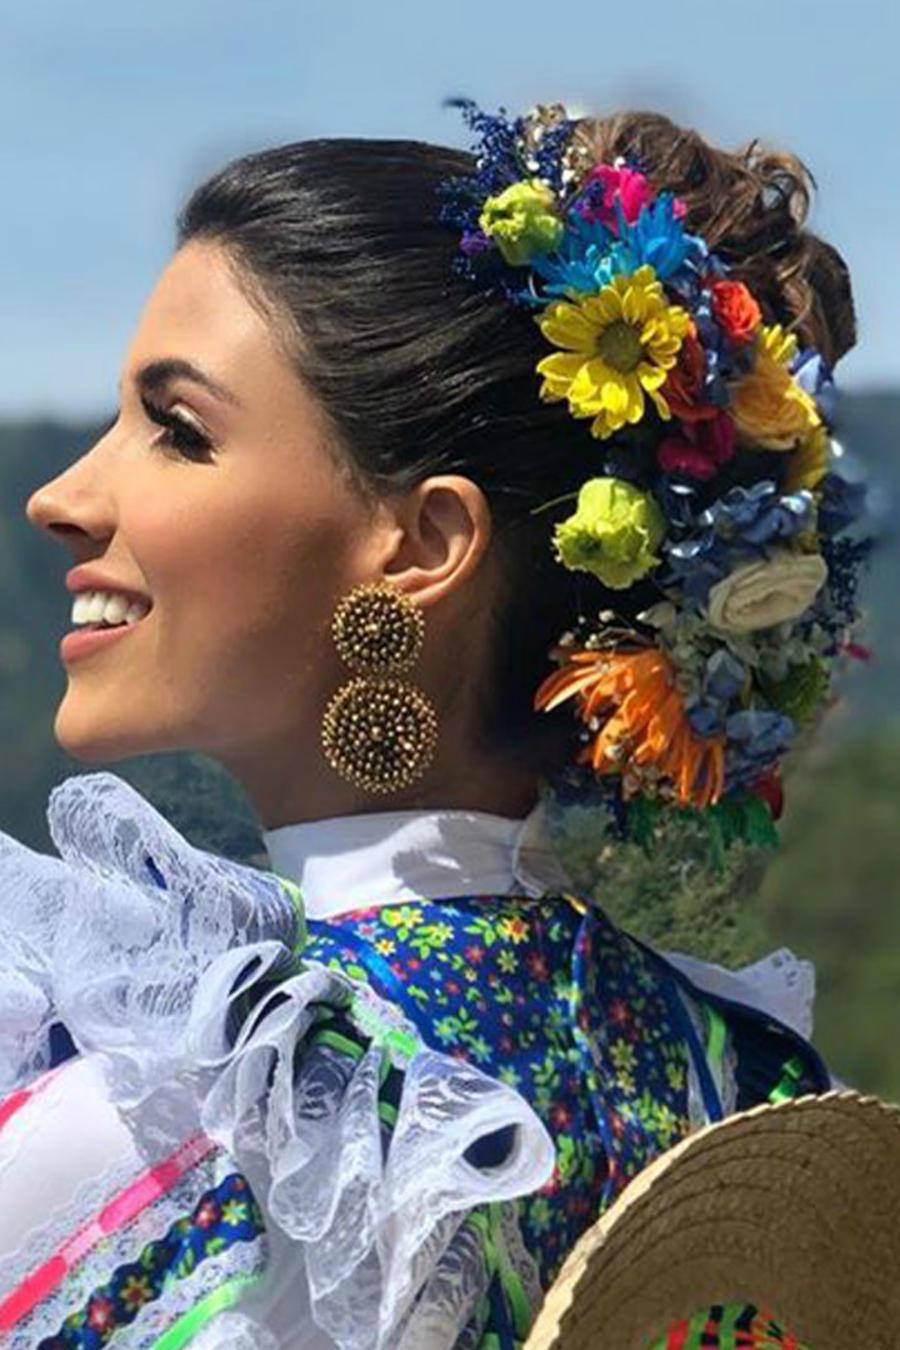 Gabriela Tafur Nader, Miss Colombia 2019, Miss Universo 2019 con traje típíco